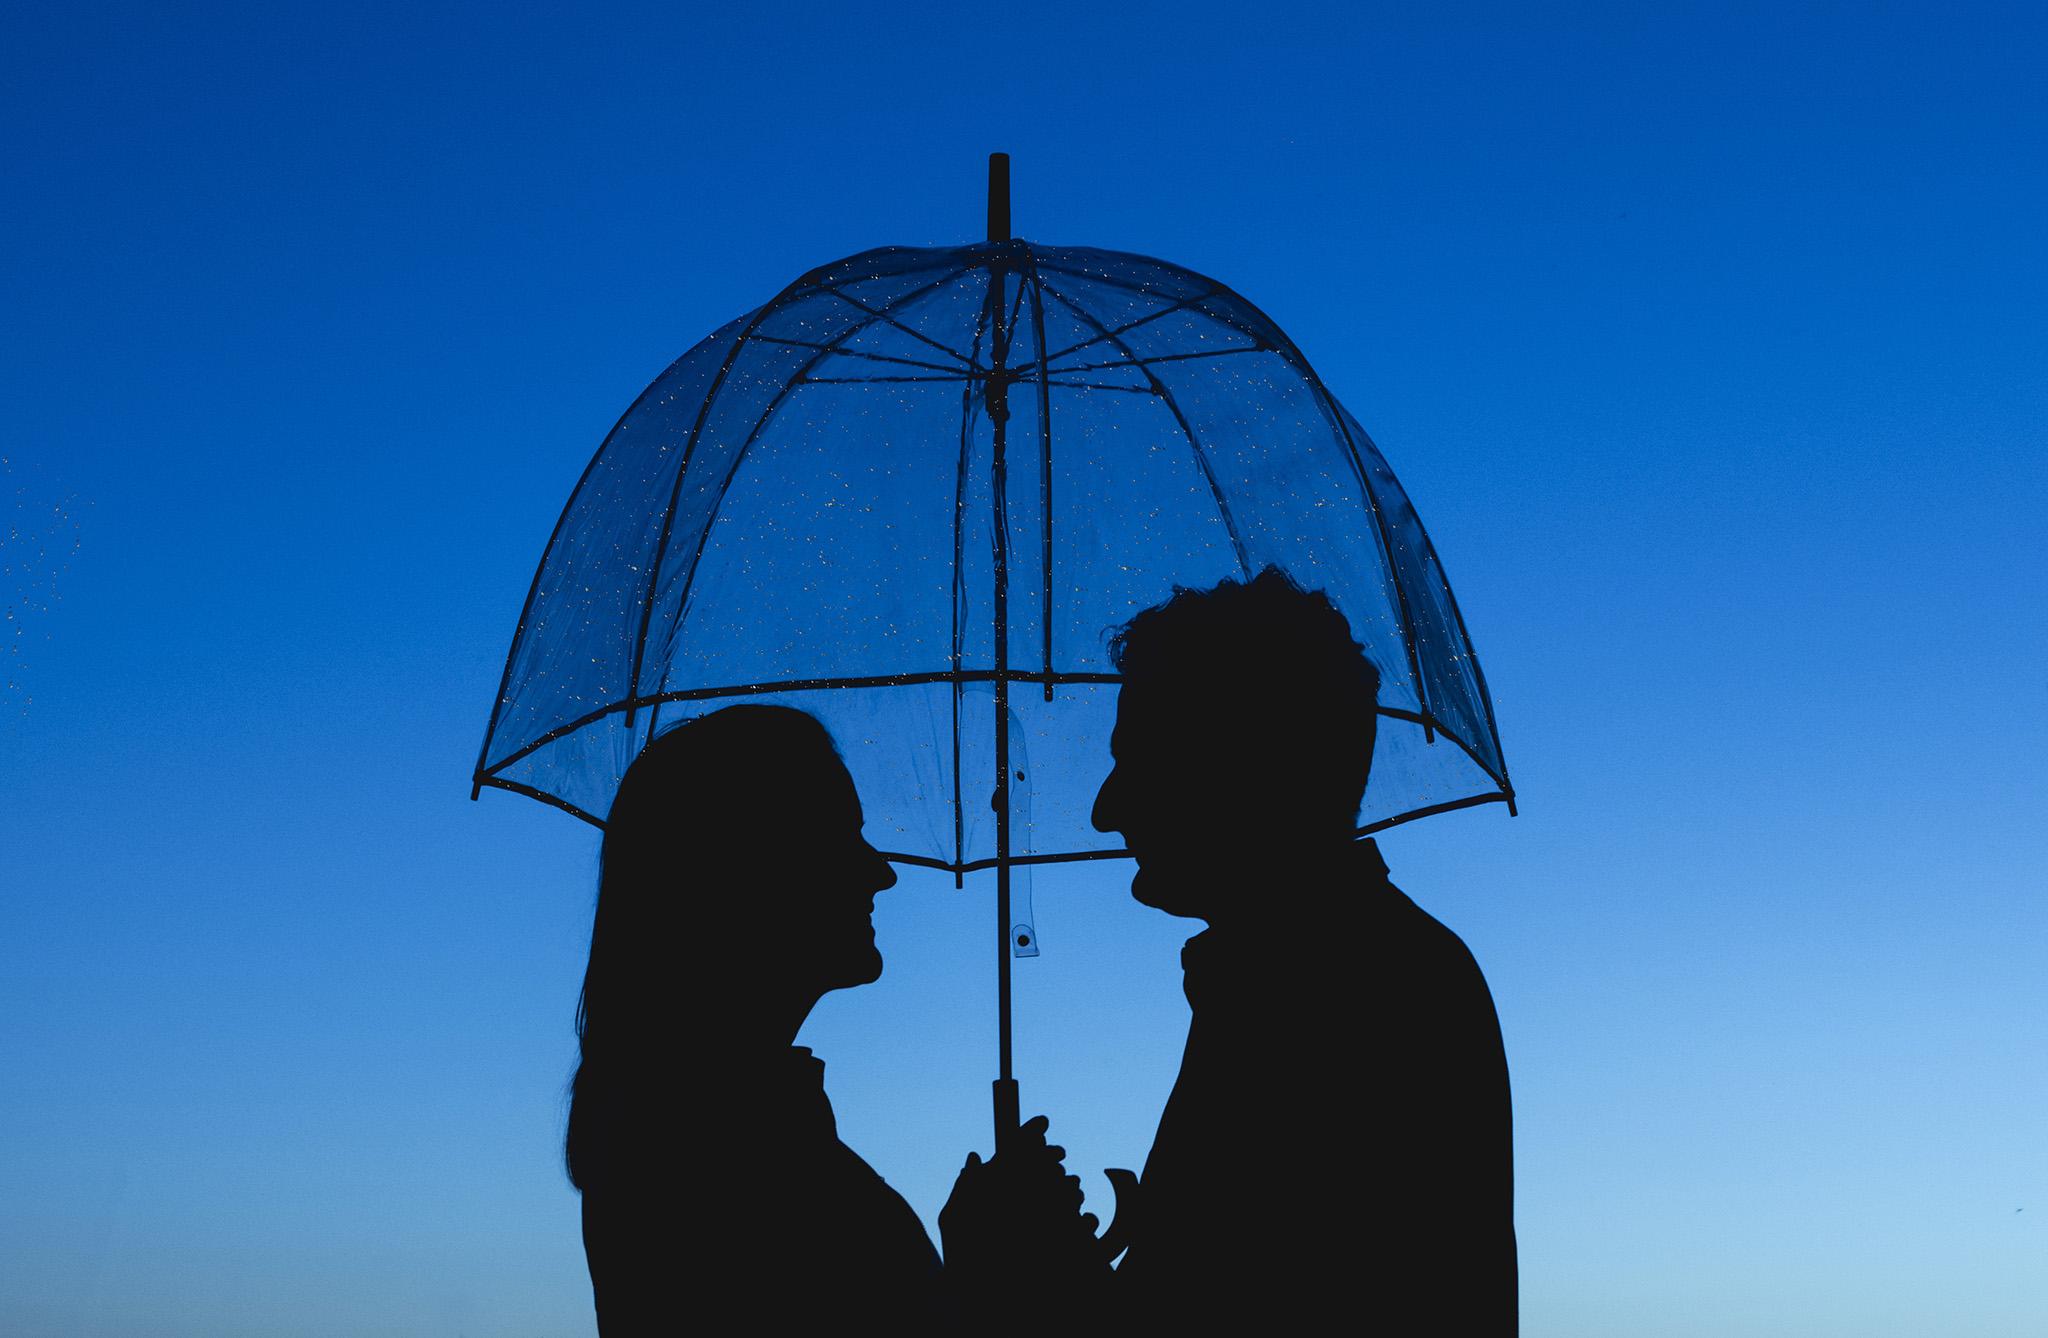 Wanda-Bubba-umbrella-1-rainsm.jpg